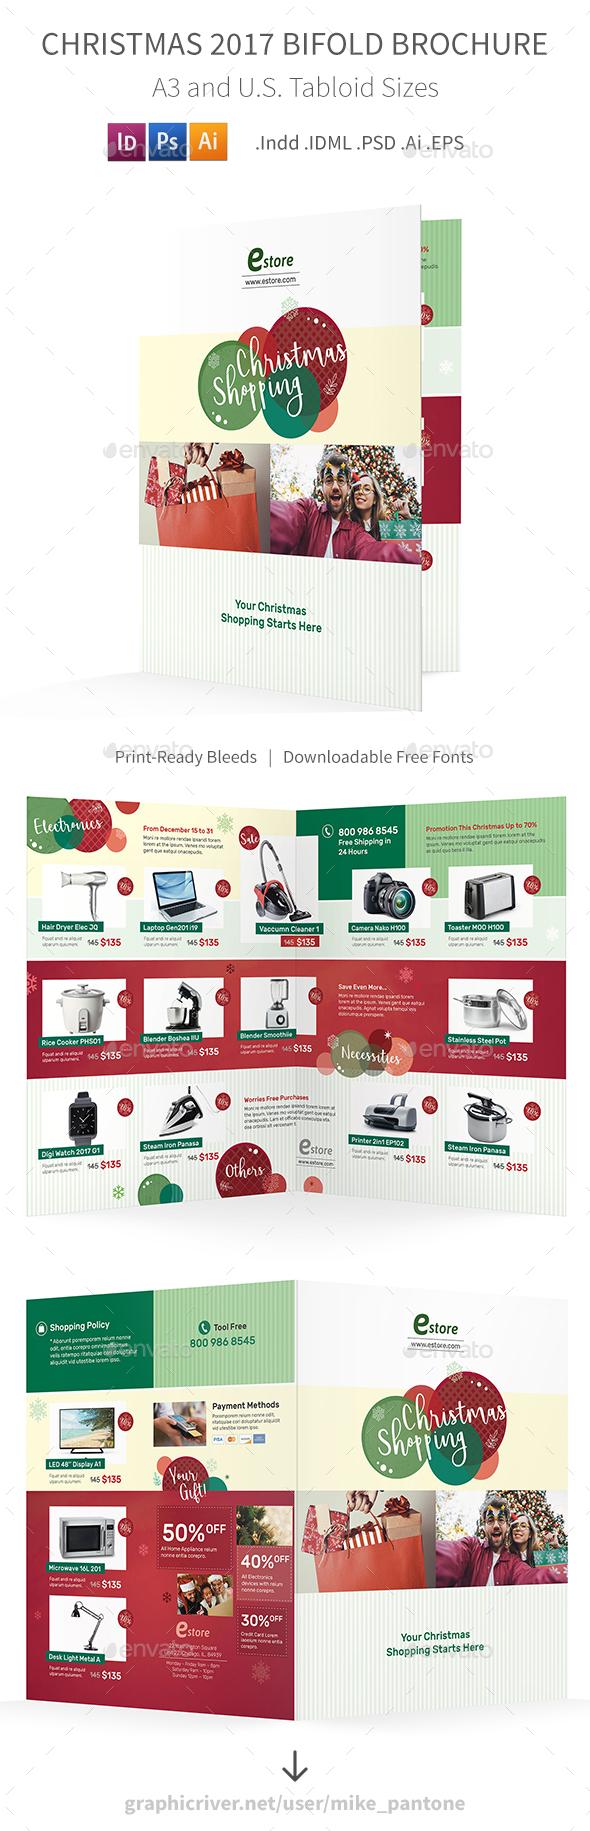 GraphicRiver Christmas 2017 Bifold Halffold Brochure 20956718